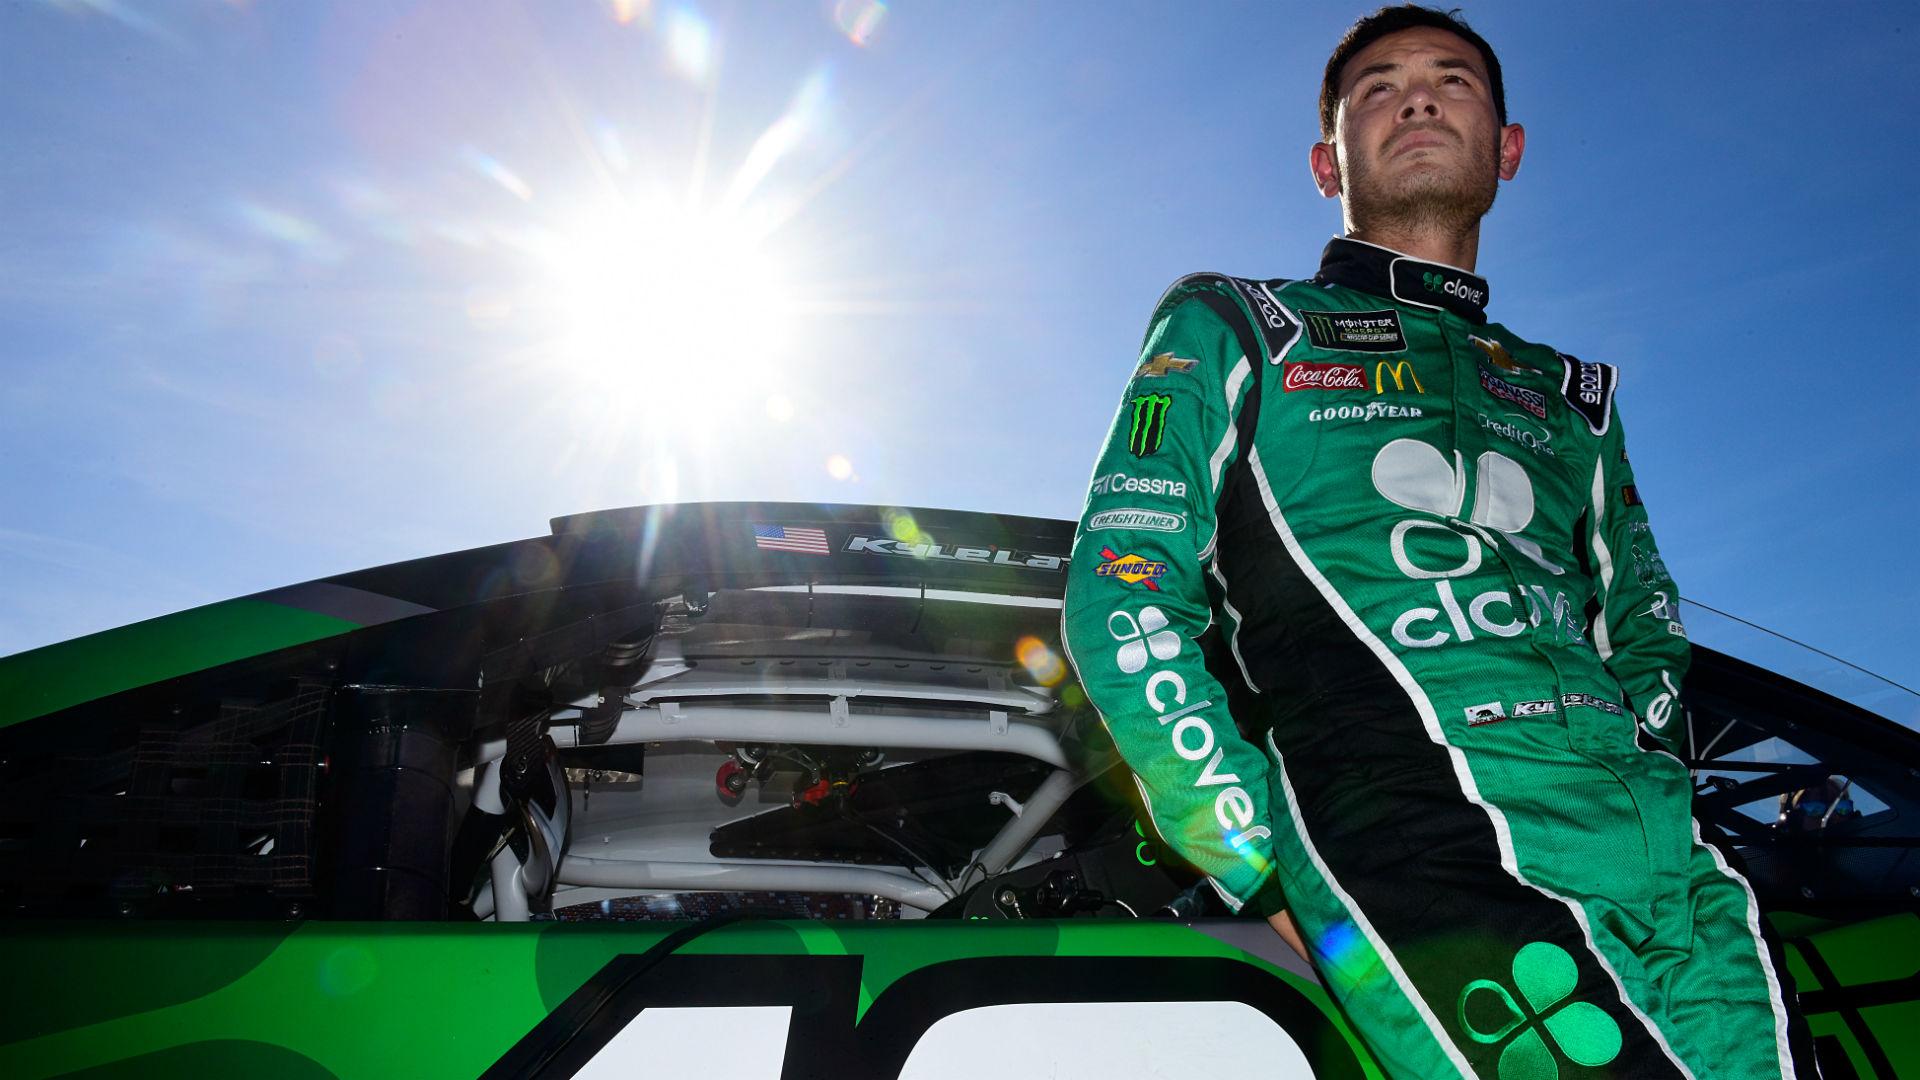 NASCAR: No changes planned as result of Kyle Larson's Talladega crash